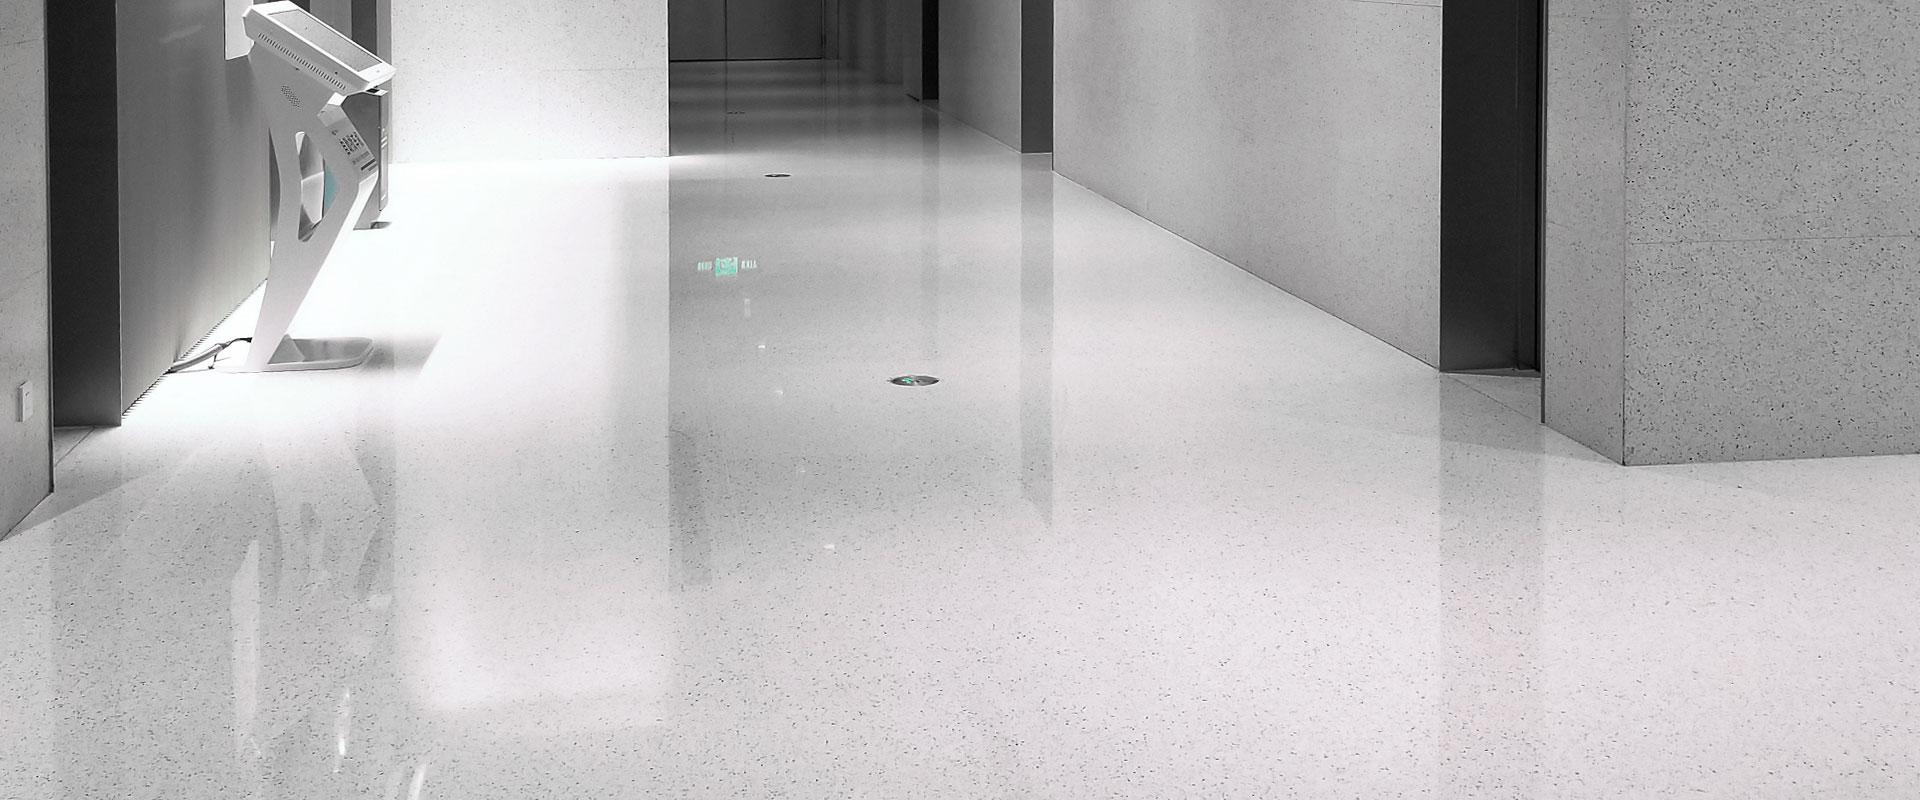 AGGLOTECH-progetto-mall-mixc-crcity-slider-4